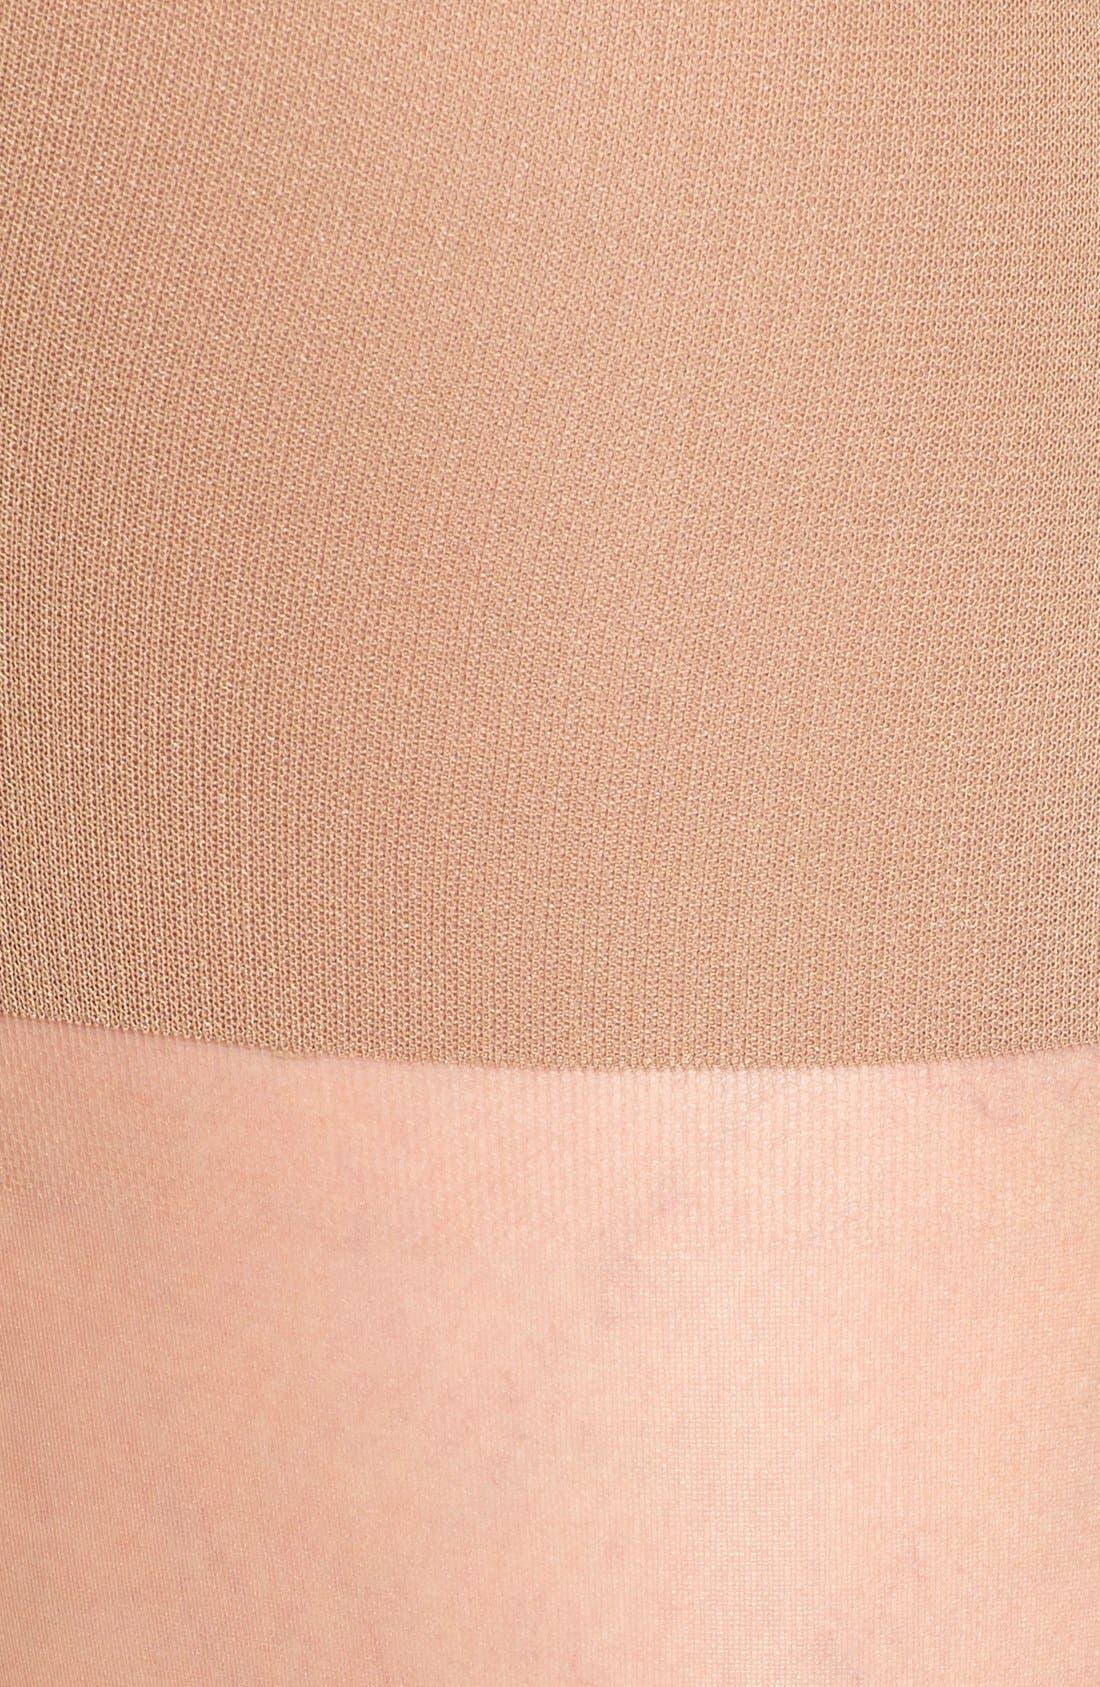 Luxe Leg Pantyhose,                             Alternate thumbnail 2, color,                             NUDE 4